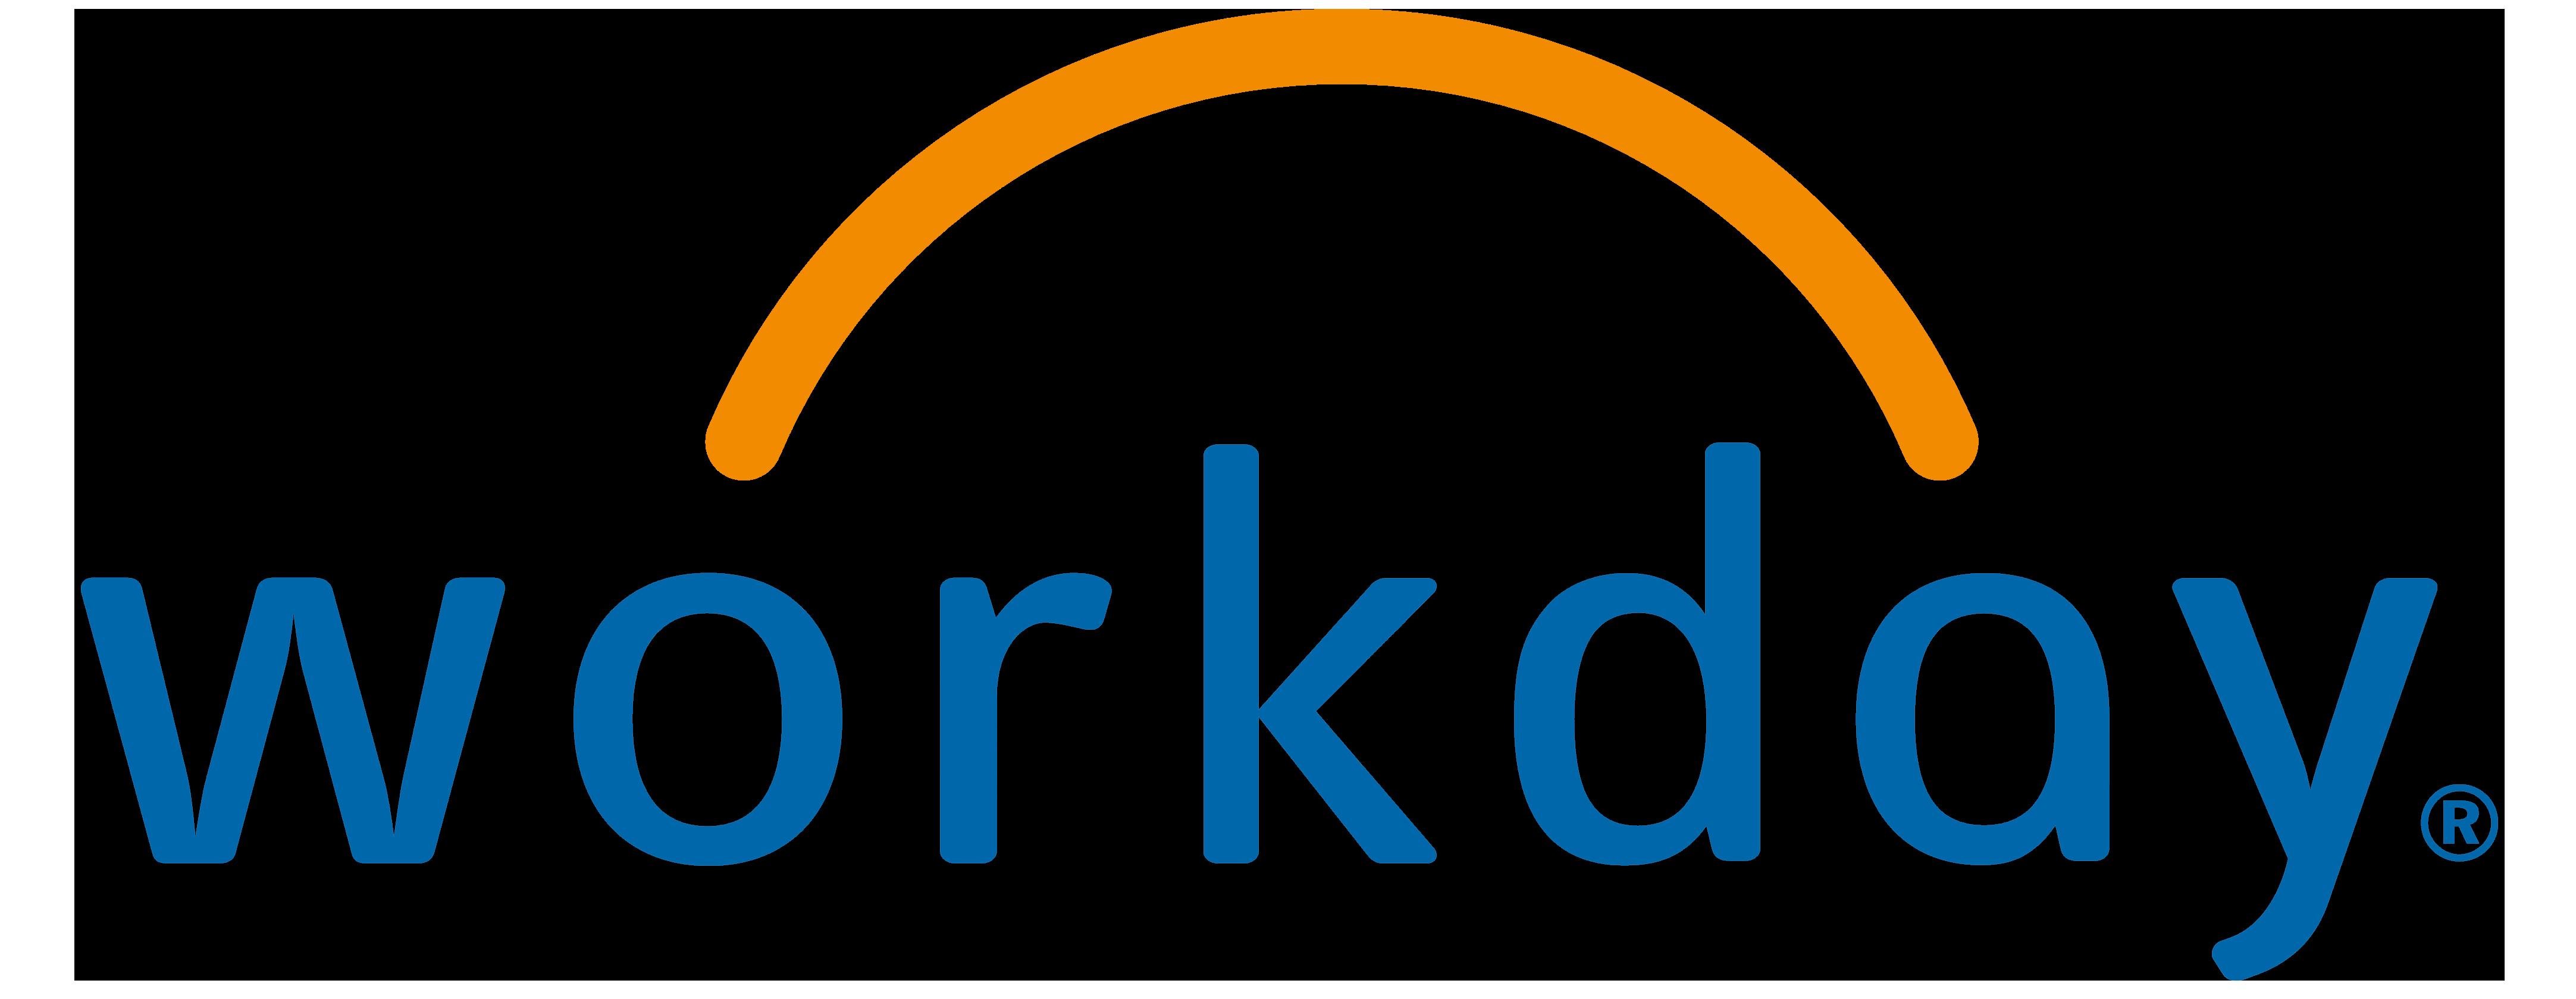 File:Workday Logo.png.